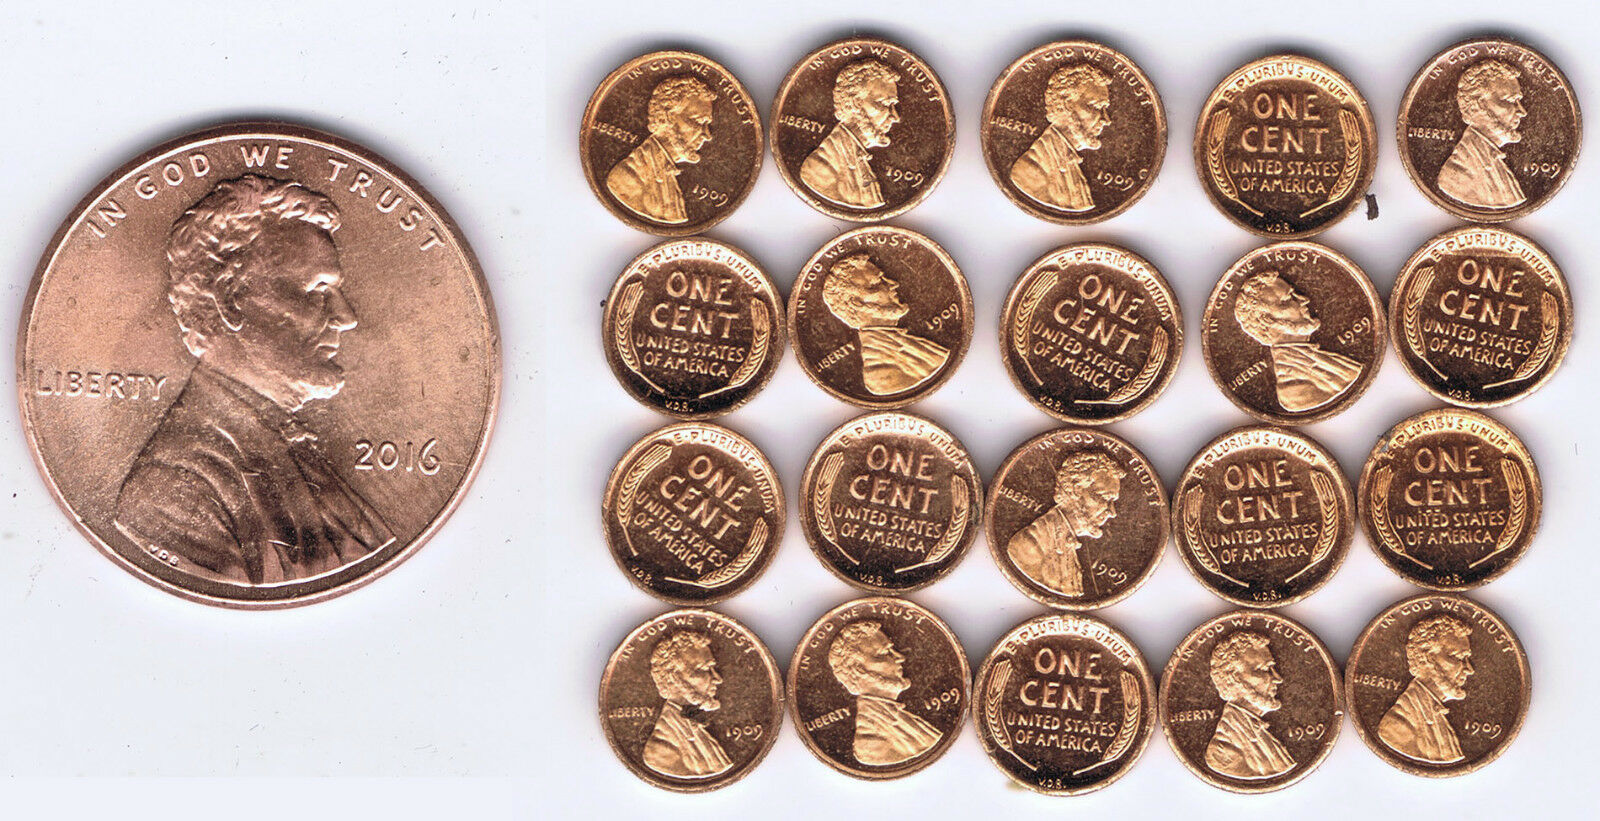 WHOLESALE USA 1909 VDB LINCOLN CENT x 20 PIECES FRANKLIN MINT HIGH QUALITY MINI